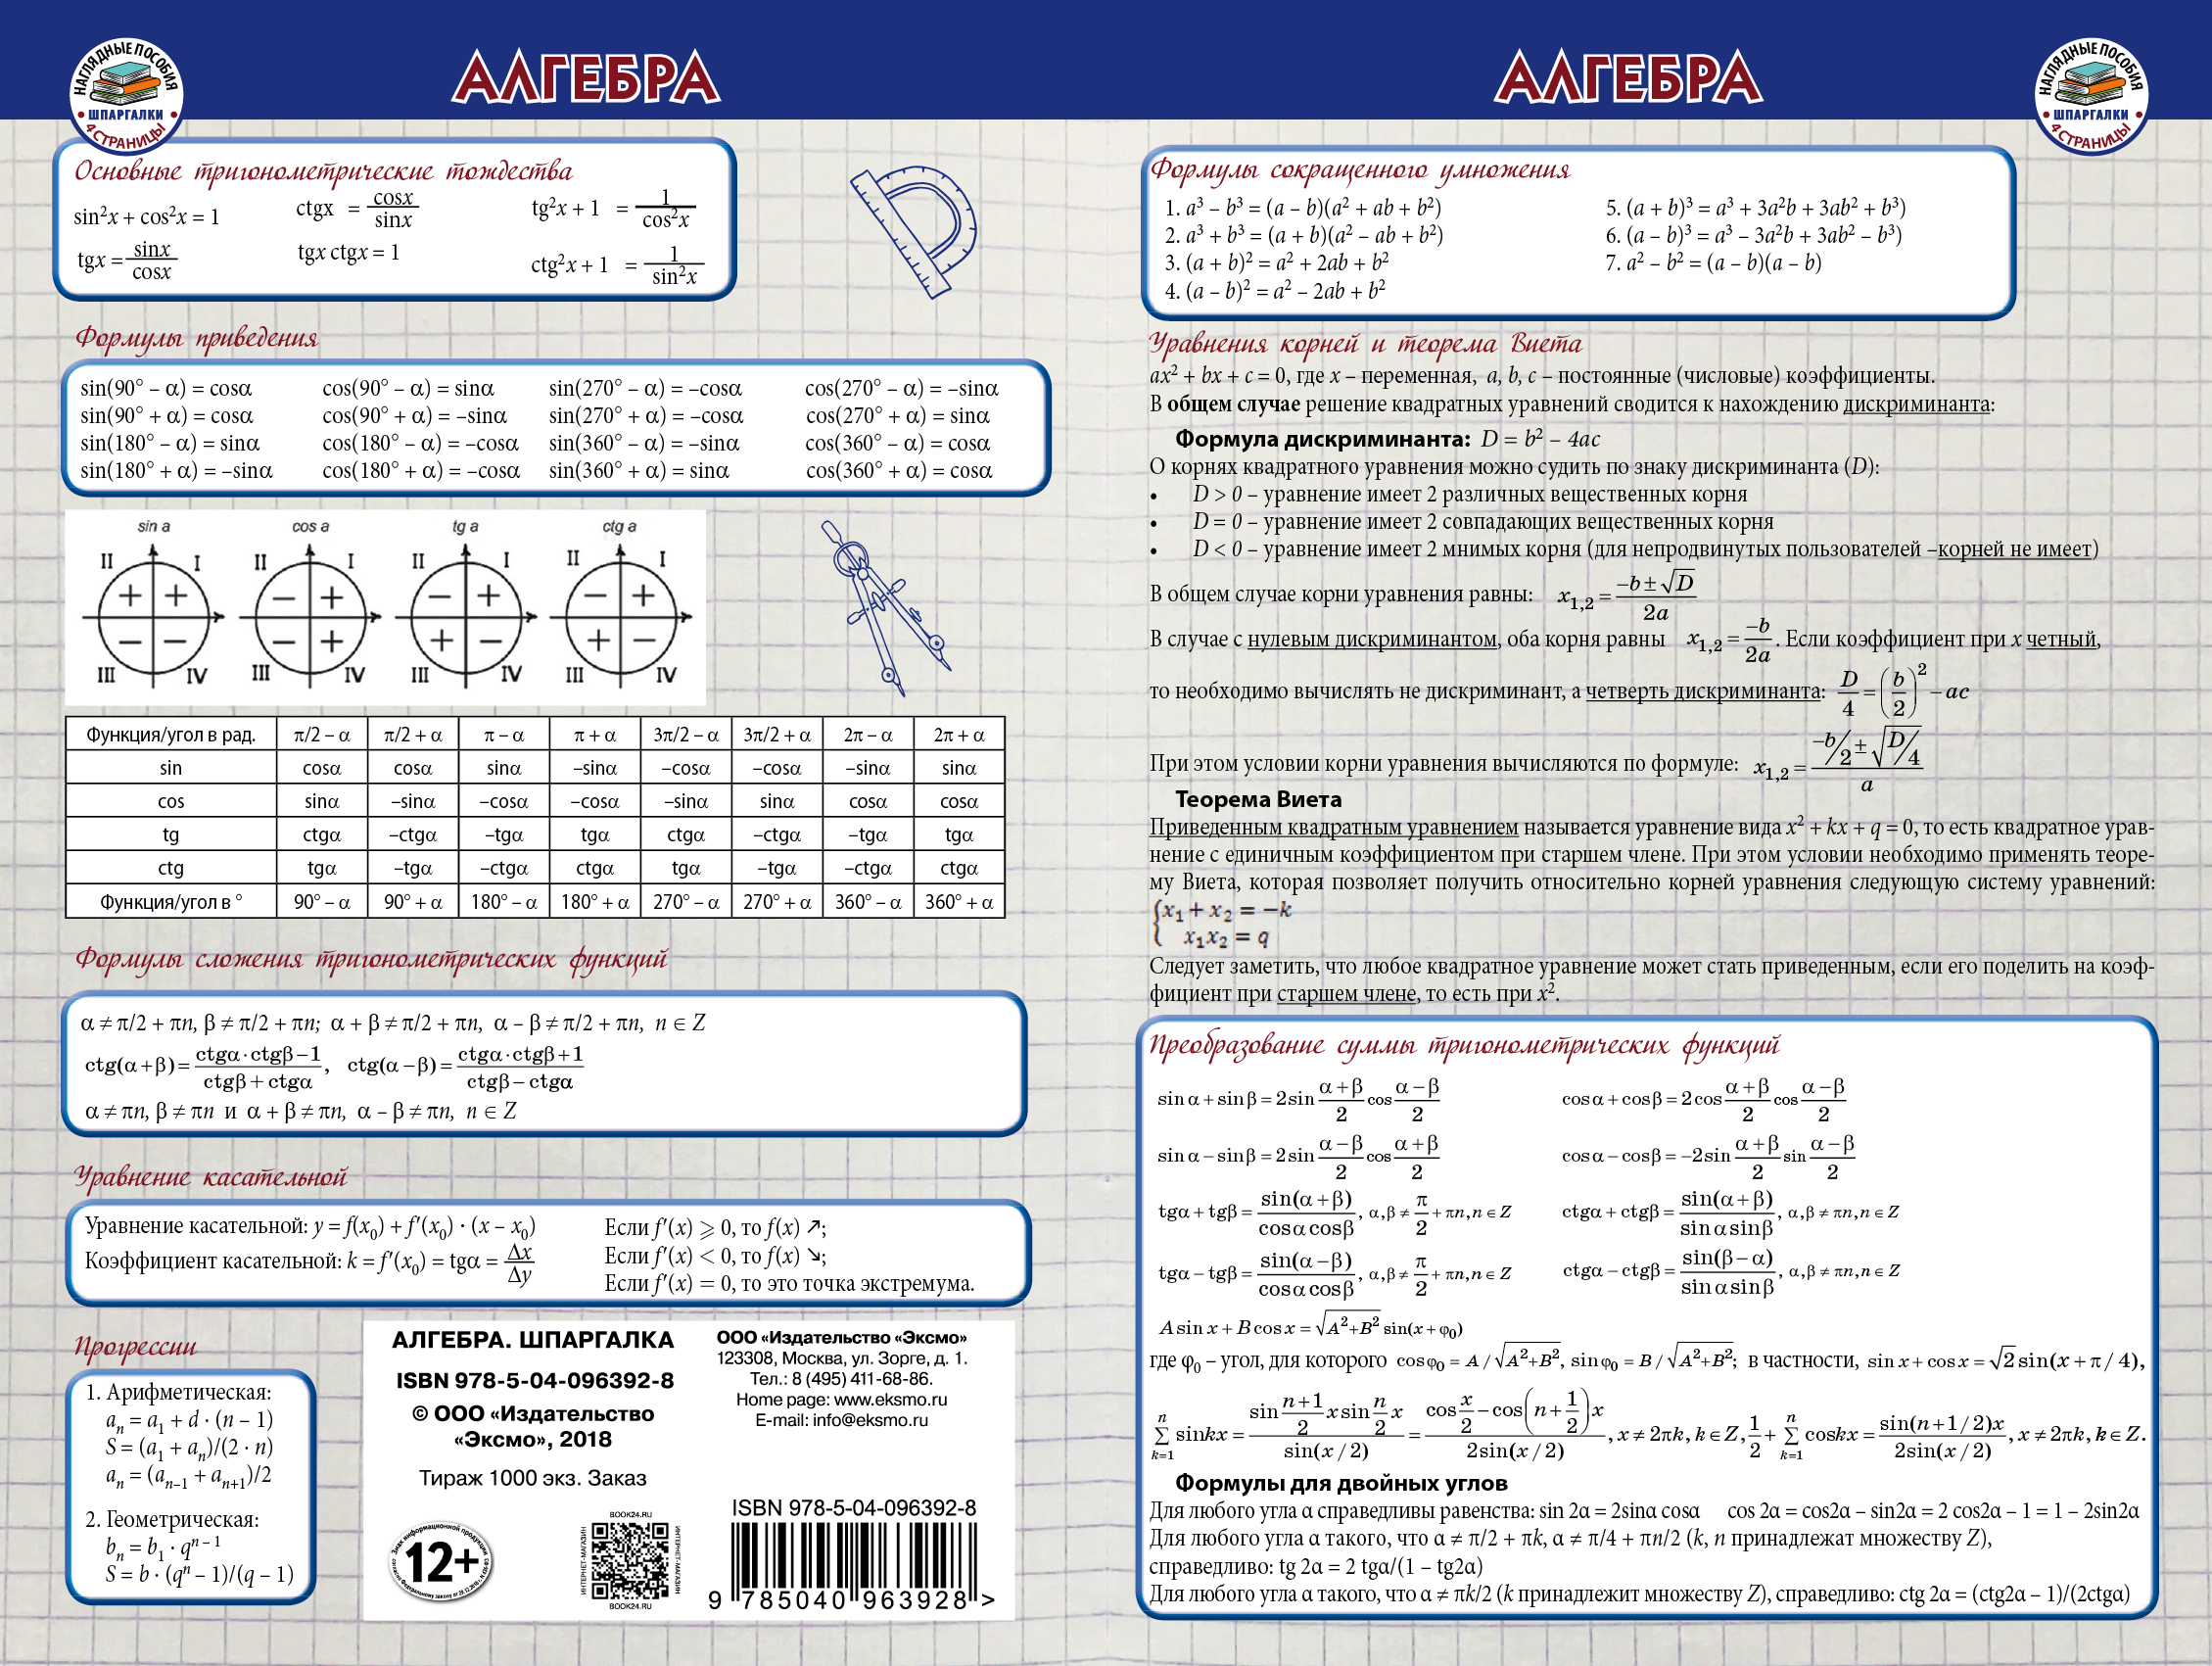 Алгебра Шпаргалка арифметика алгебра геометрия шпаргалка